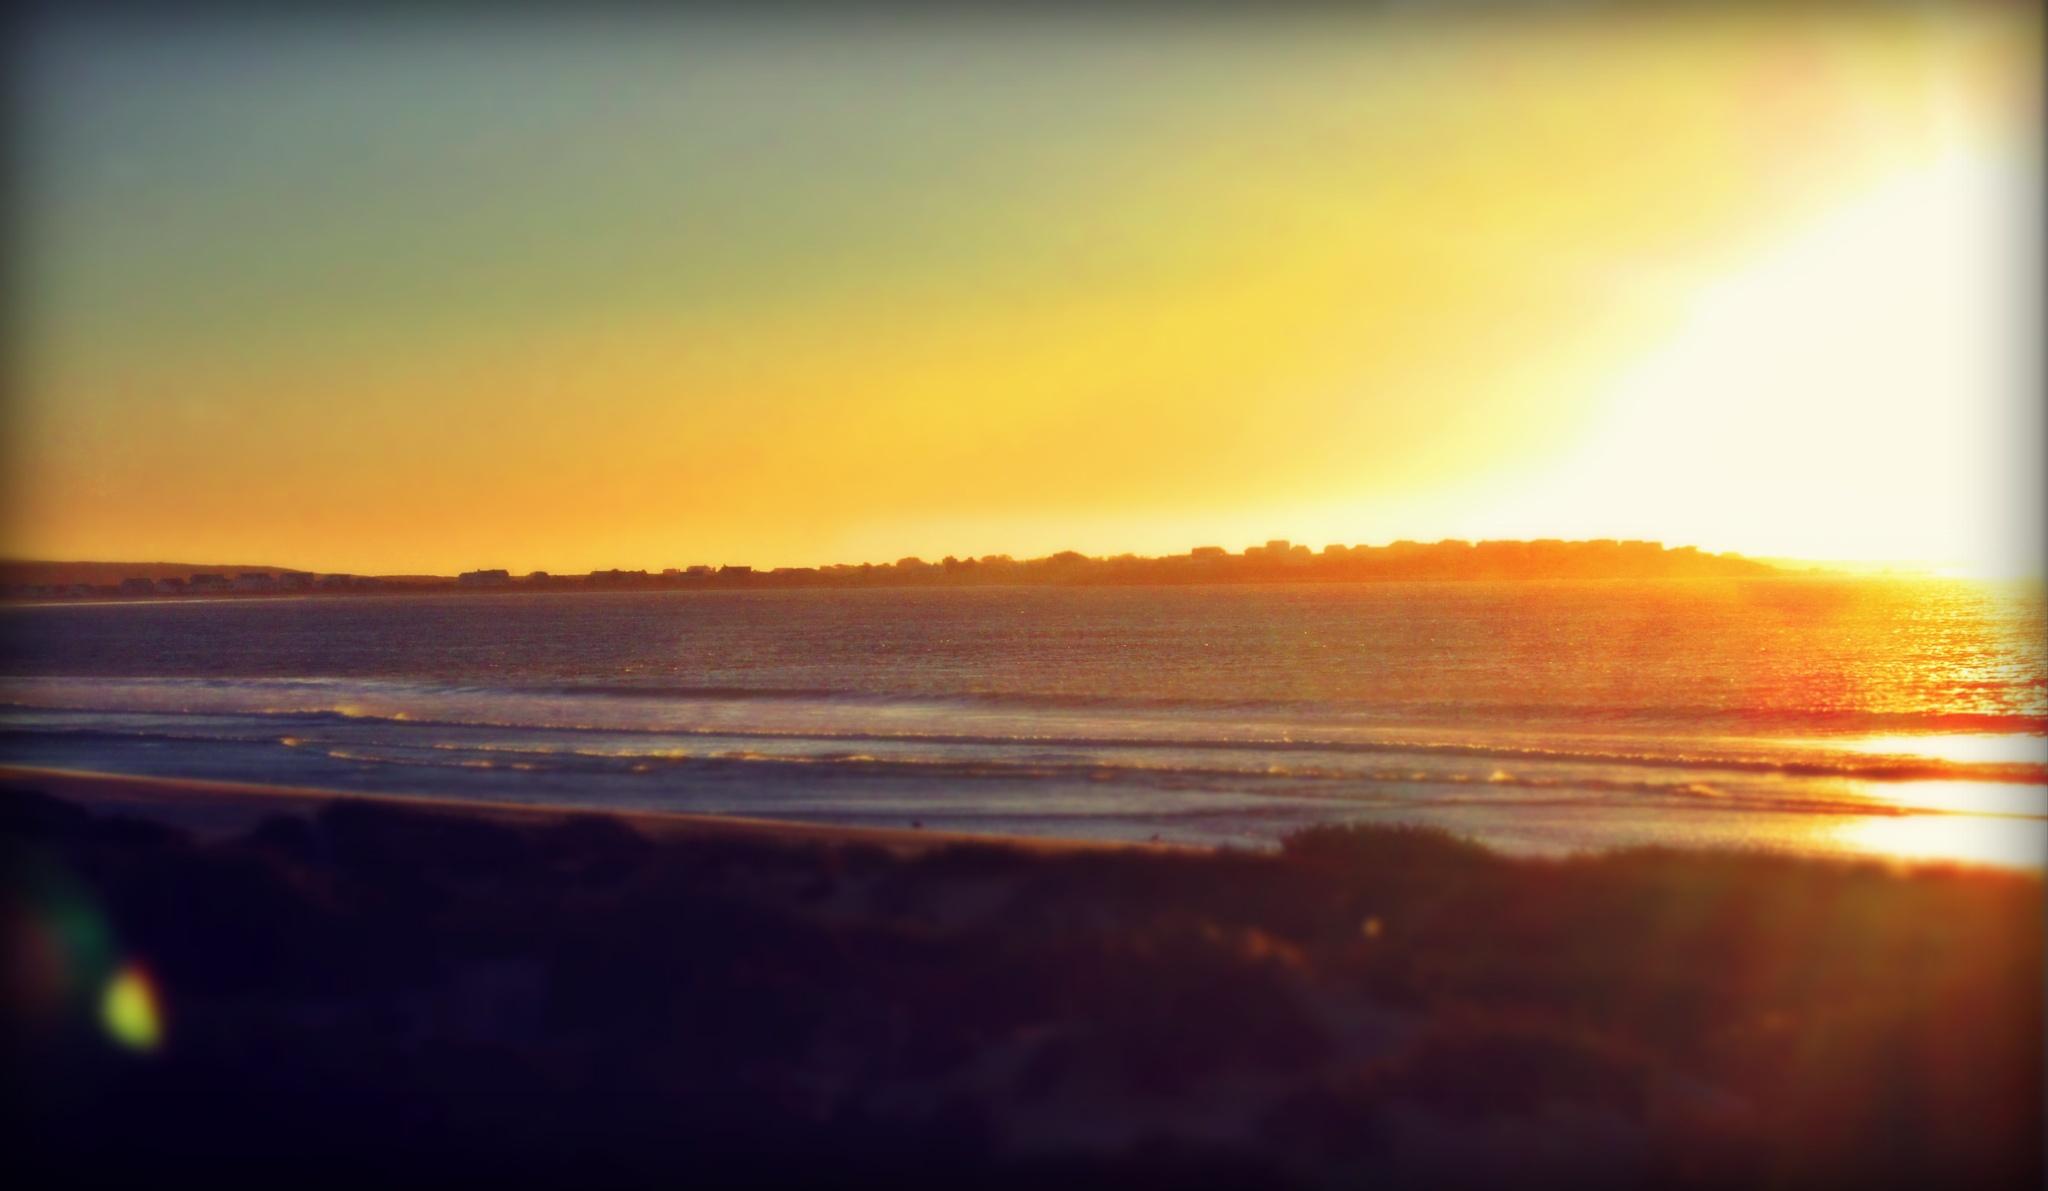 Sunset to Sea by Kate Blake